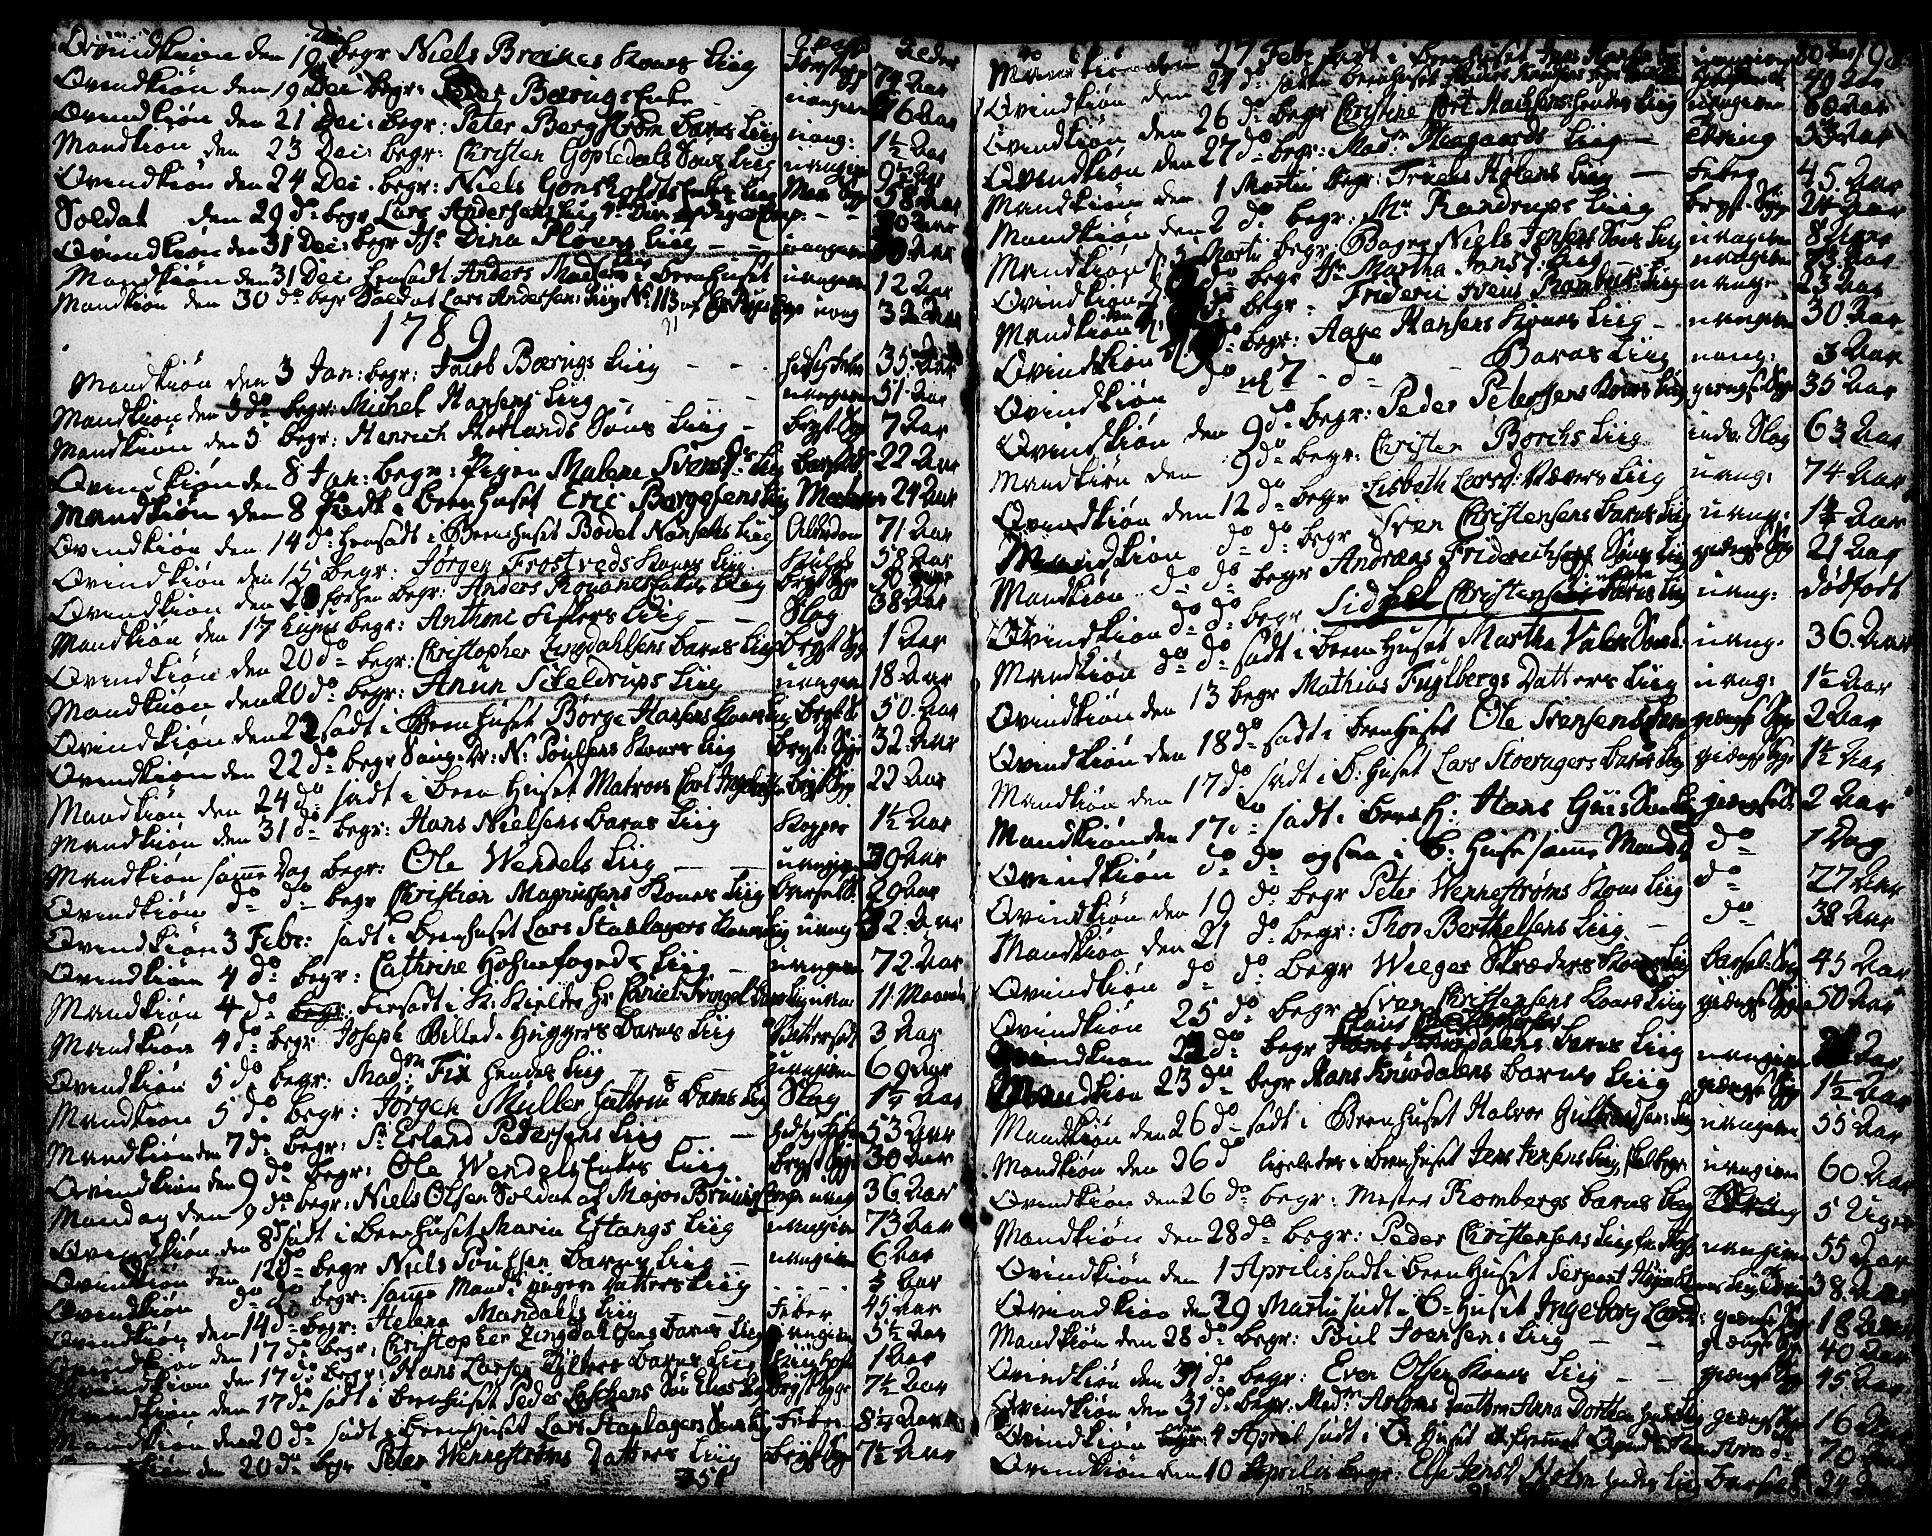 SAKO, Larvik kirkebøker, G/Ga/L0001: Klokkerbok nr. I 1, 1785-1807, s. 197